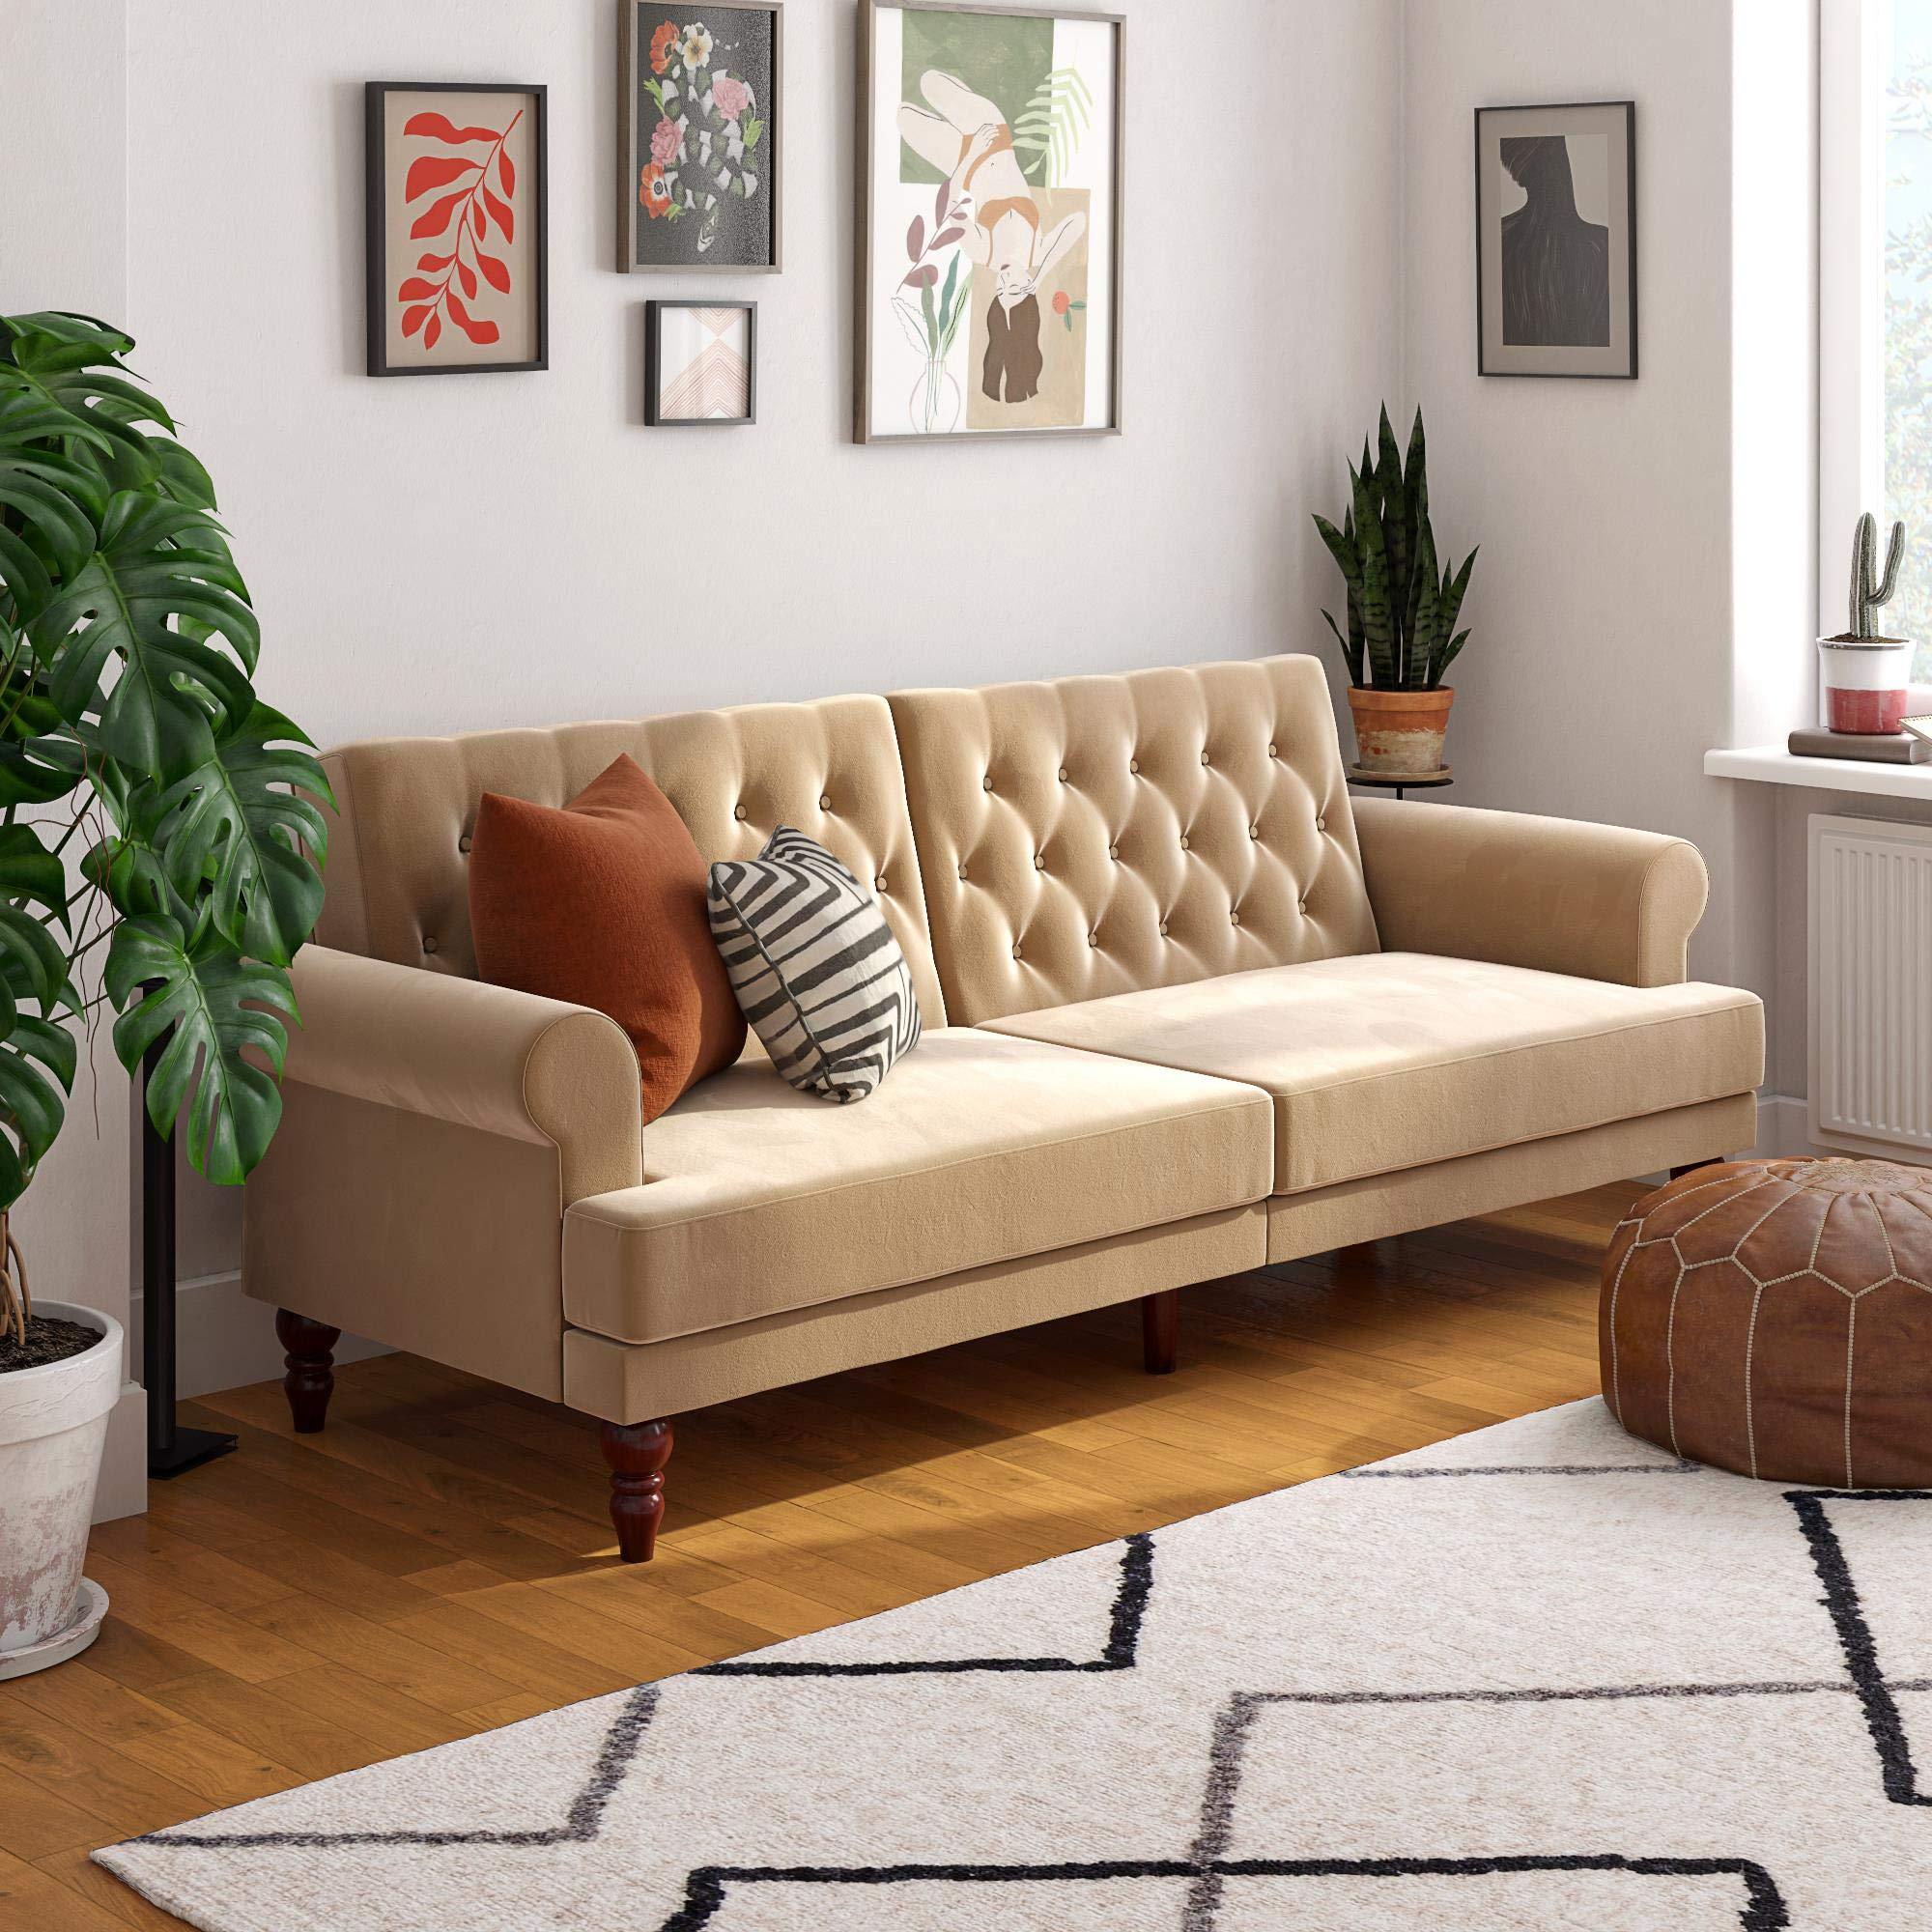 Novogratz Upholstered Cassidy, Convertible Couch, Ivory Velvet Futon by Novogratz